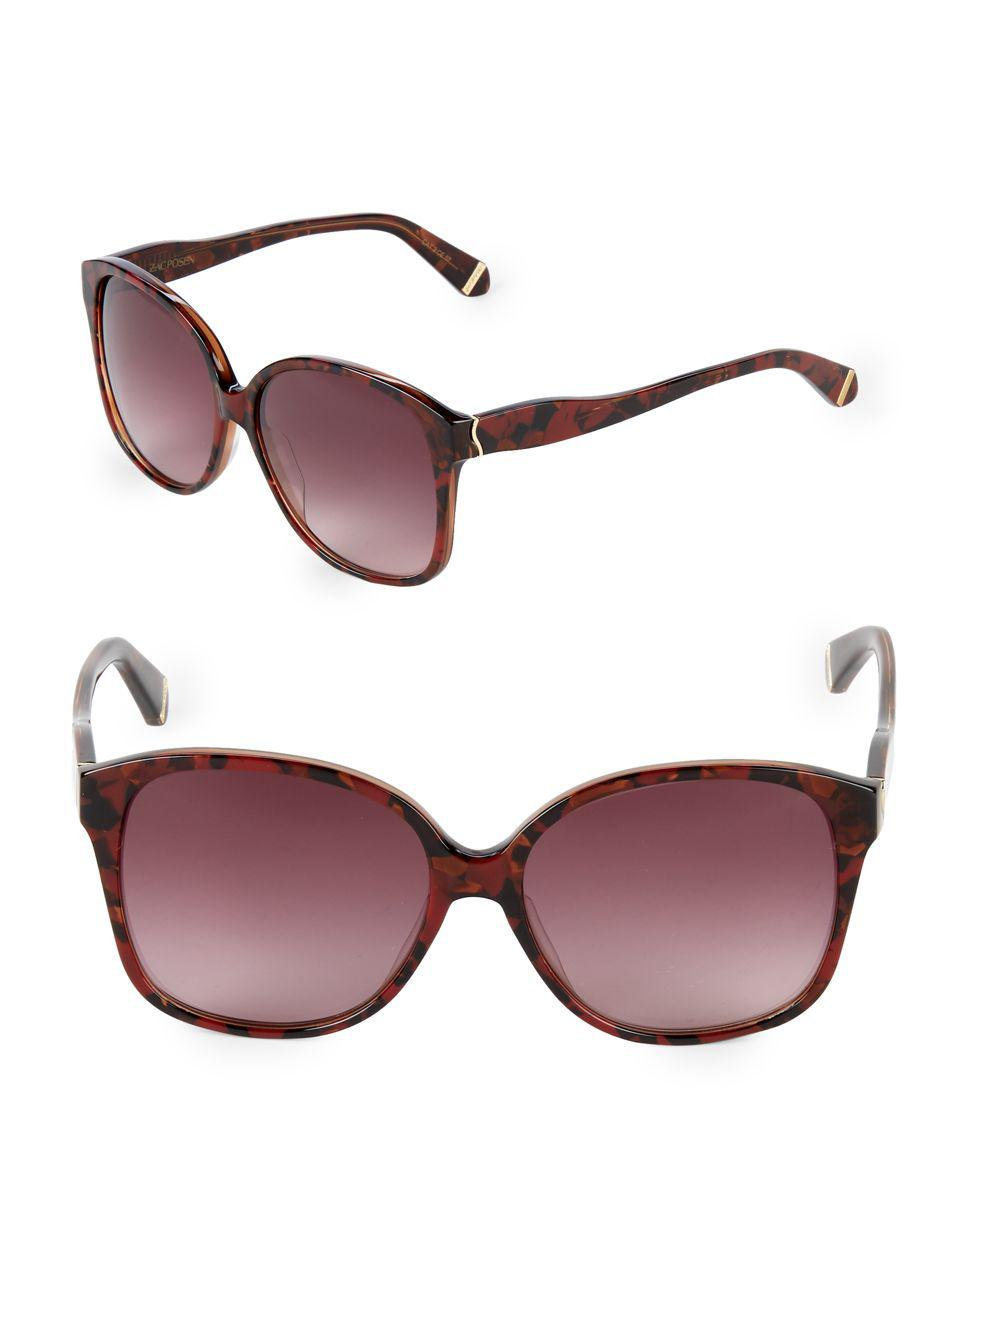 03f15af76f8 Lyst - Zac Posen Anita 58mm Square Sunglasses in Red